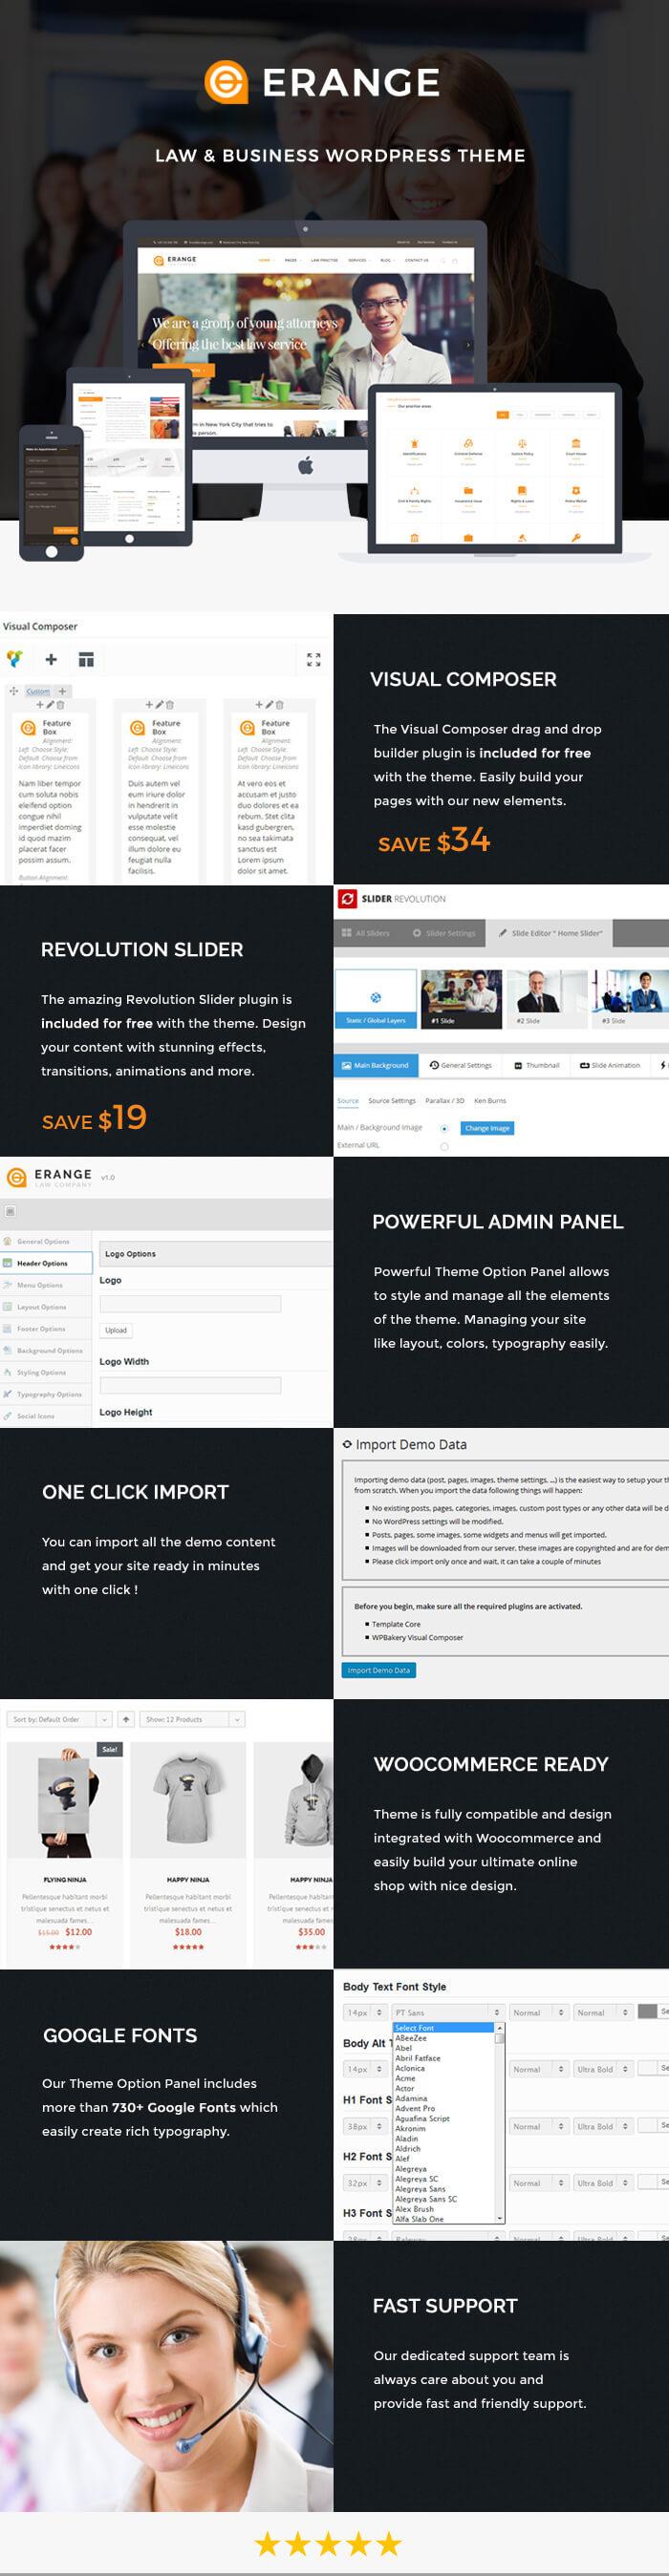 Erange- Law Firm WordPress Theme - 1